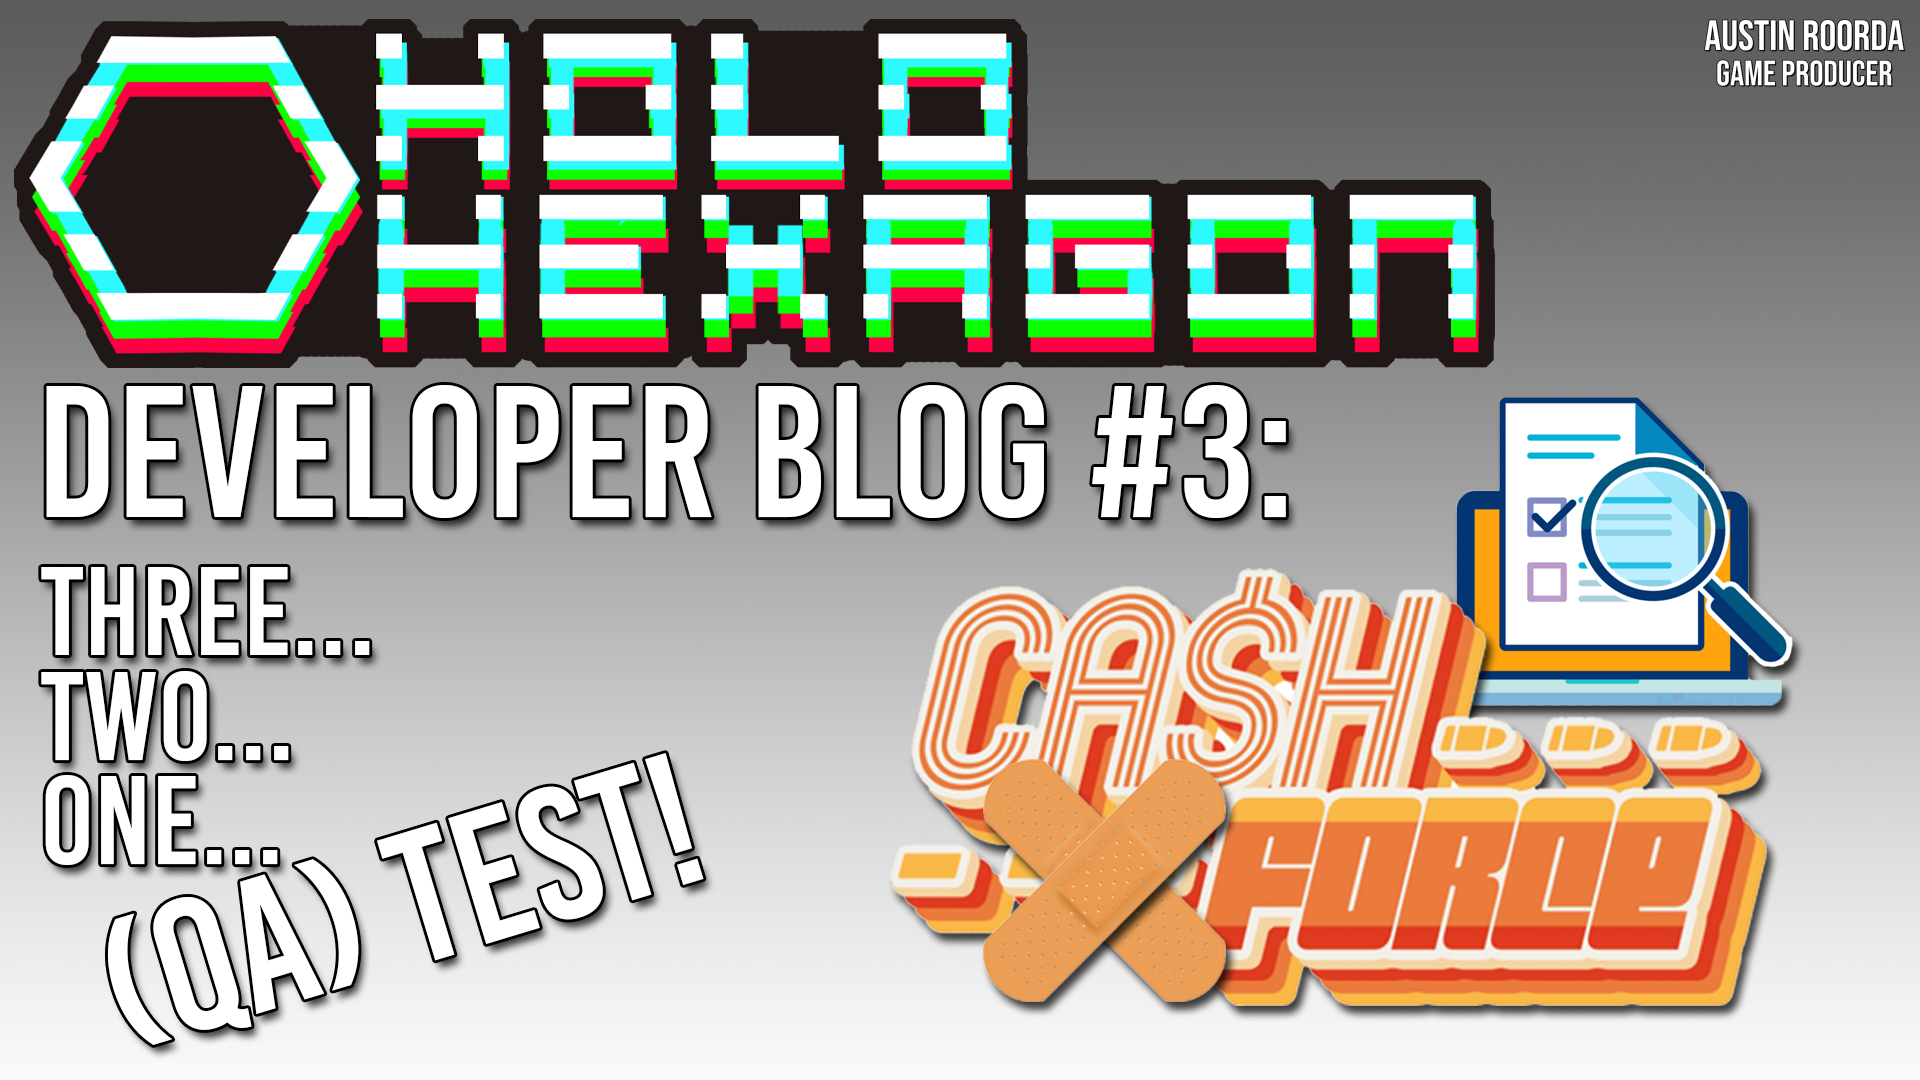 Developer Blog #3: Three… Two… One… (QA) Test!